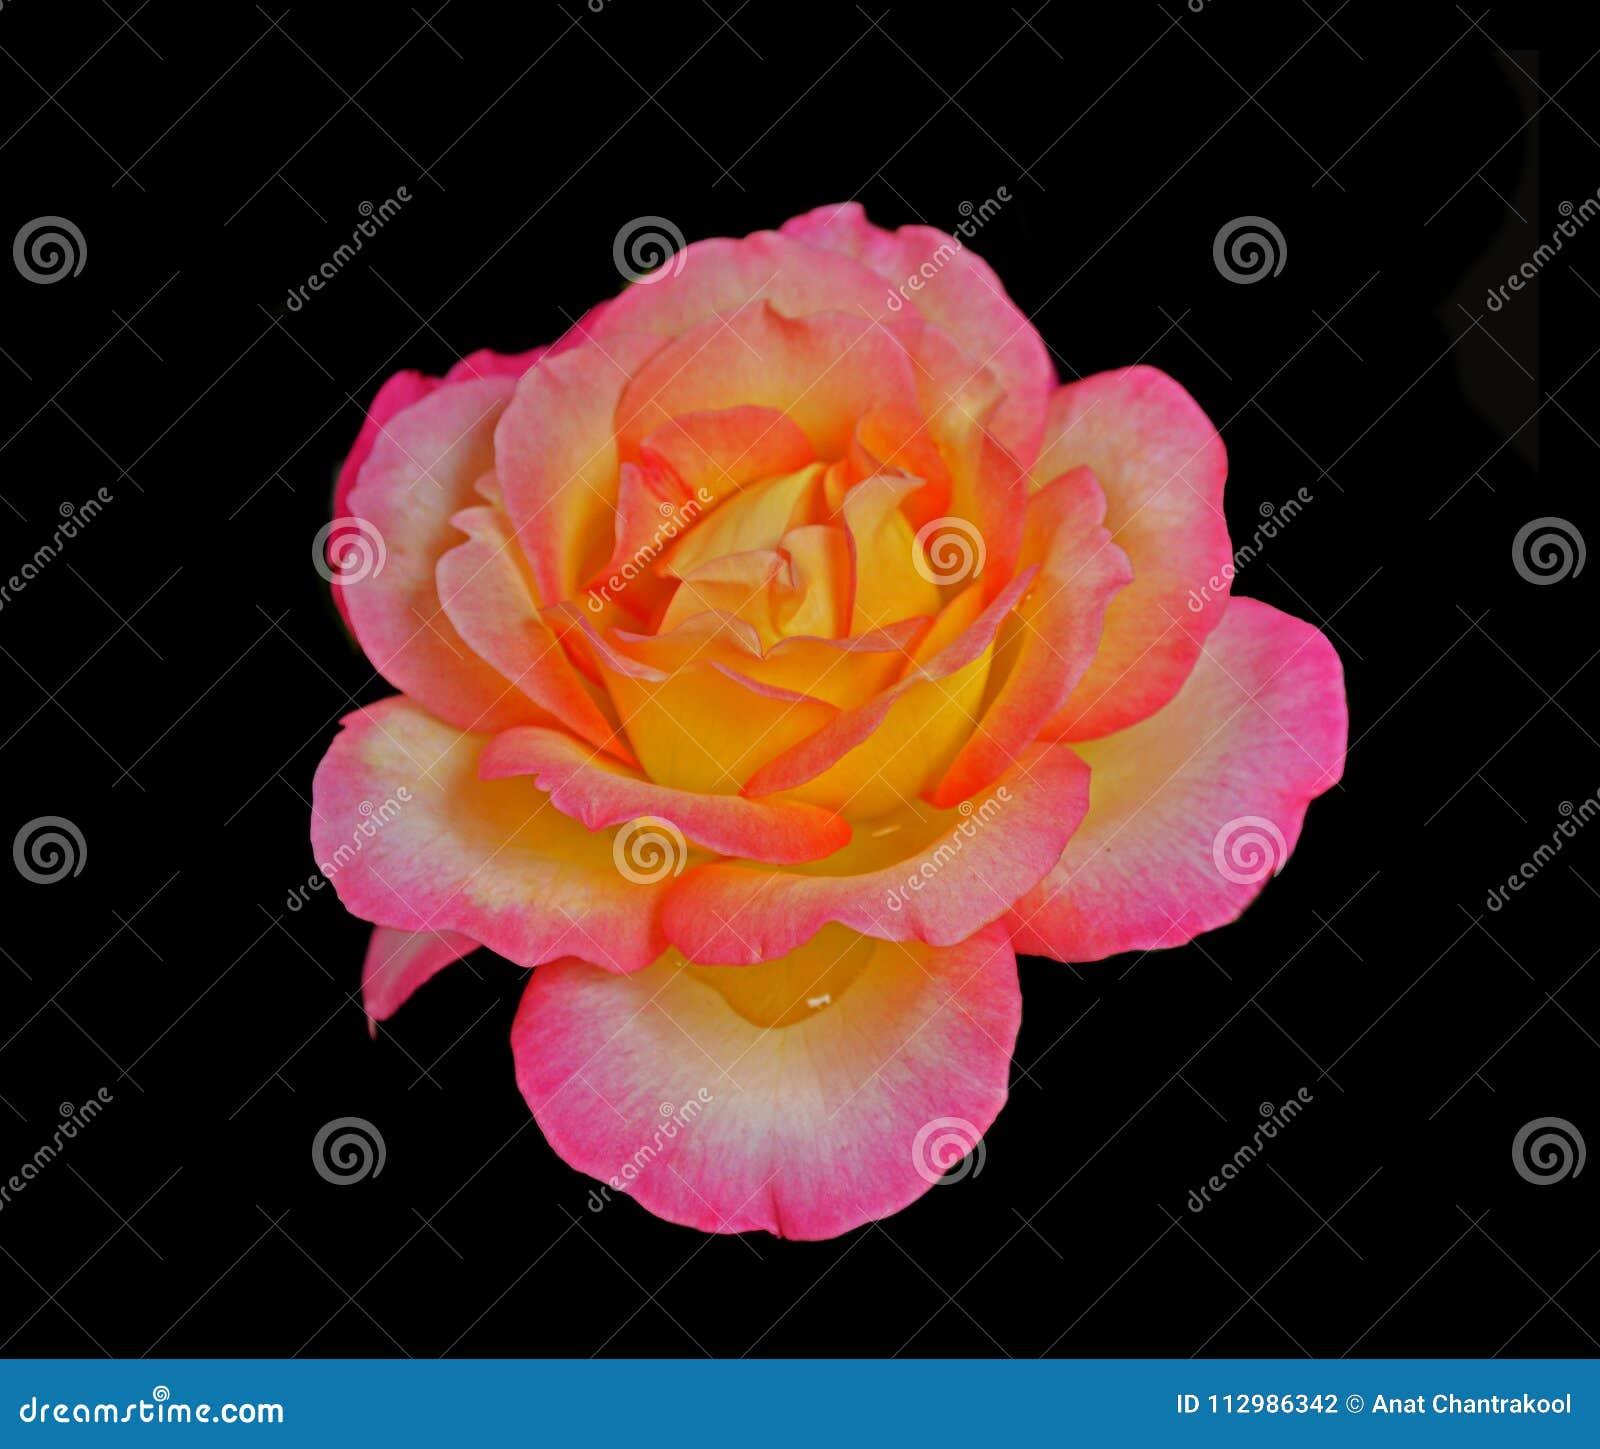 Beautiful Reddish yellow rose isolated on black